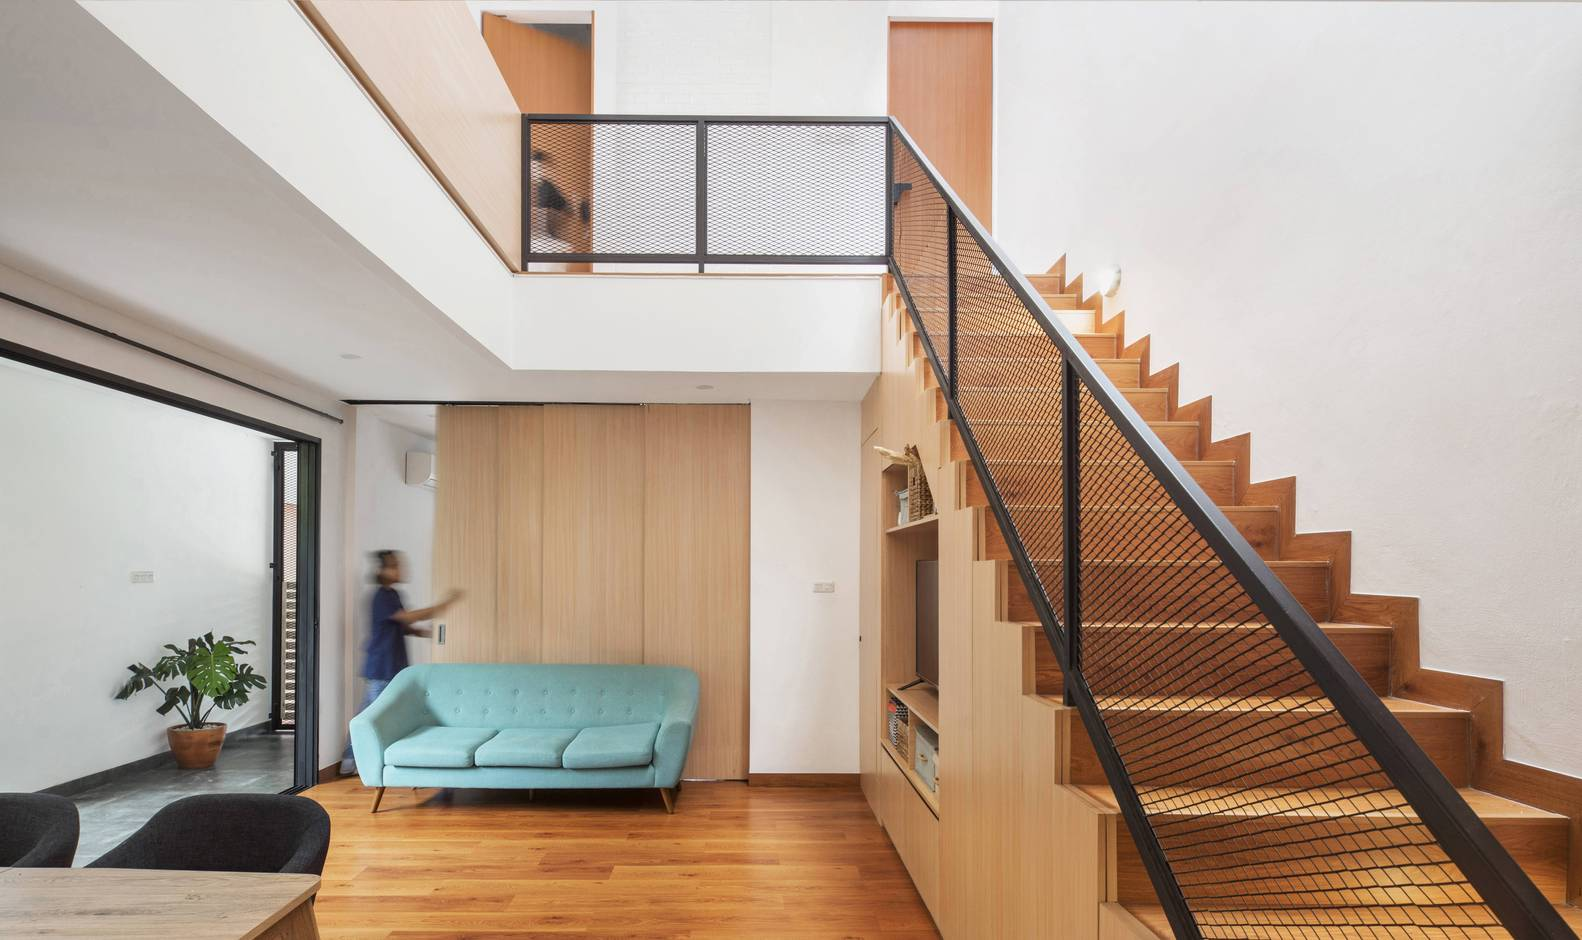 2_Elora-House_Atelier-Bertiga_Inspirationist